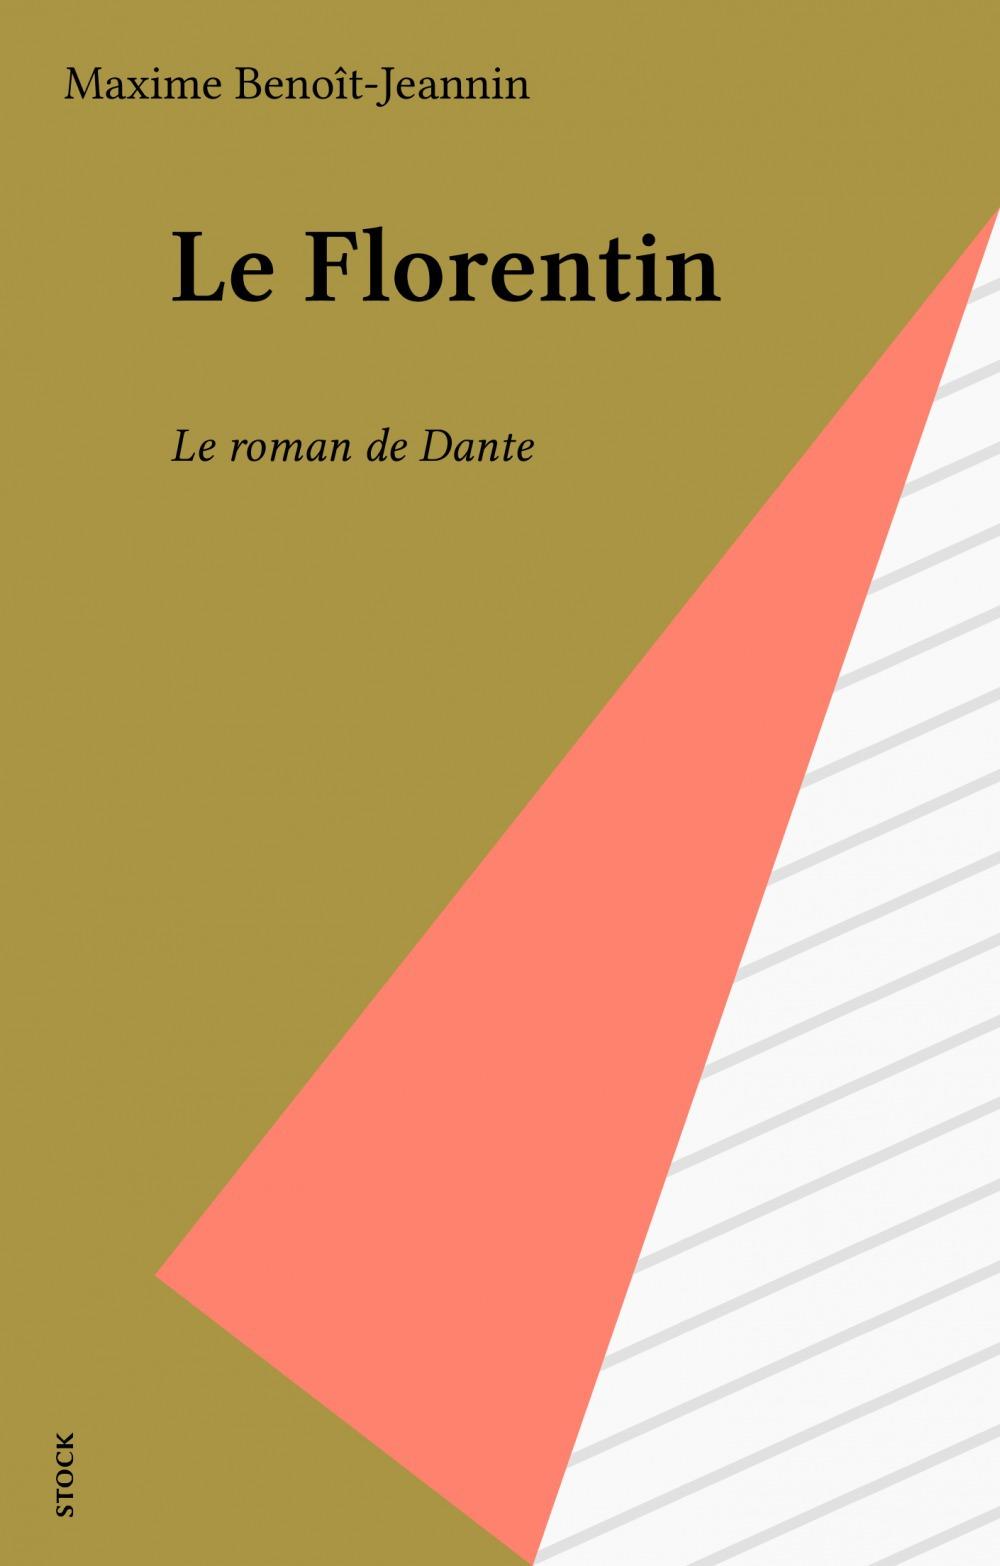 Maxime Benoît-Jeannin Le Florentin